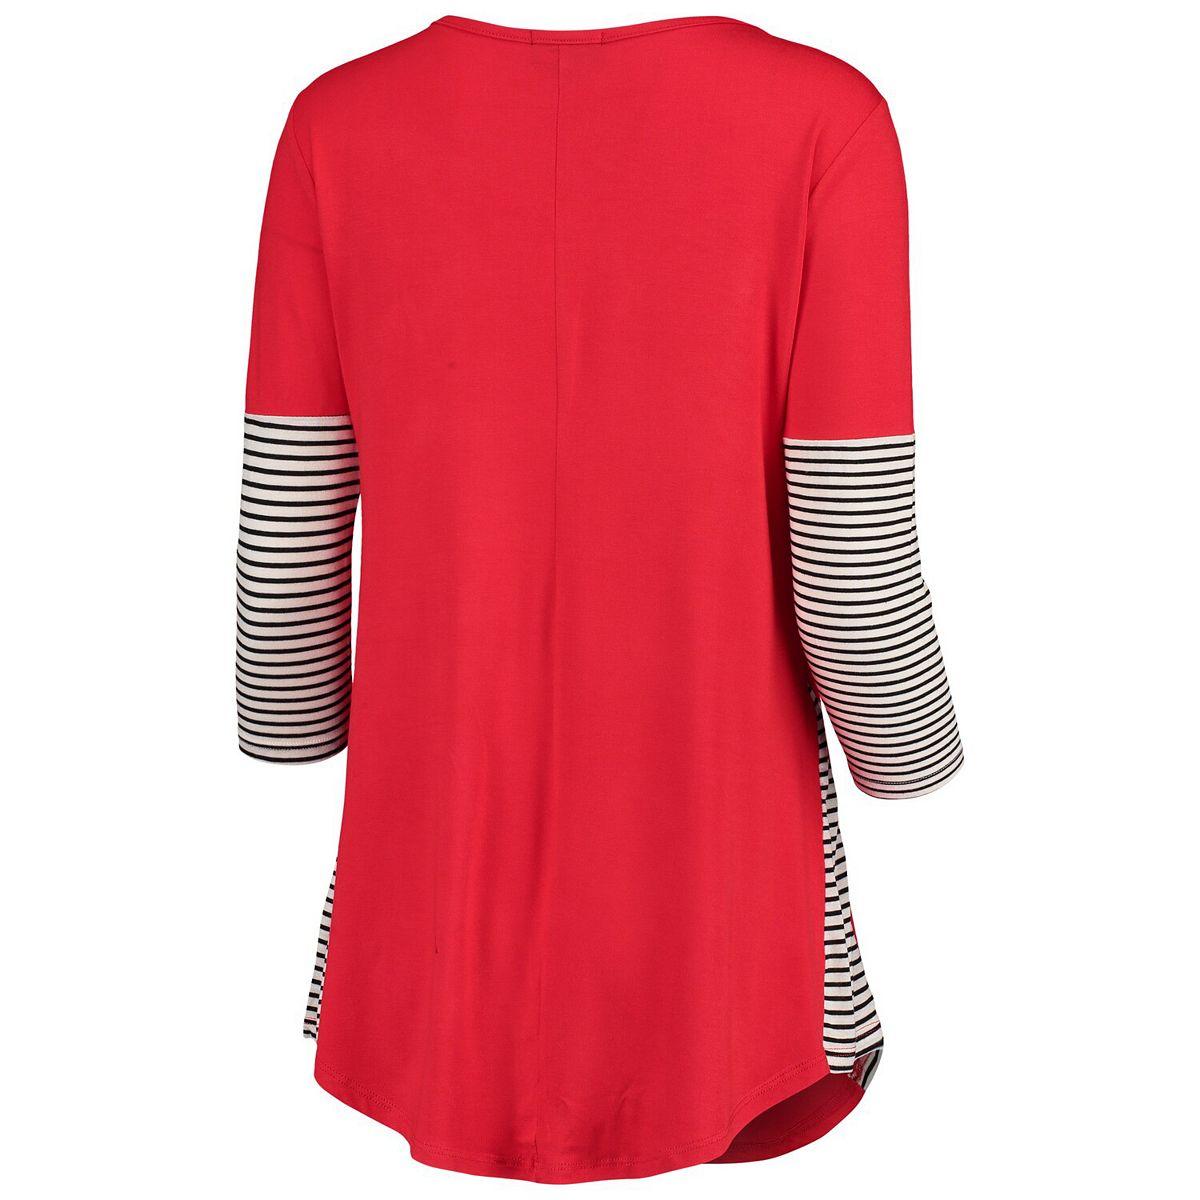 Women's Red Wisconsin Badgers Striking in Stripes Tunic Shirt 5cXVI